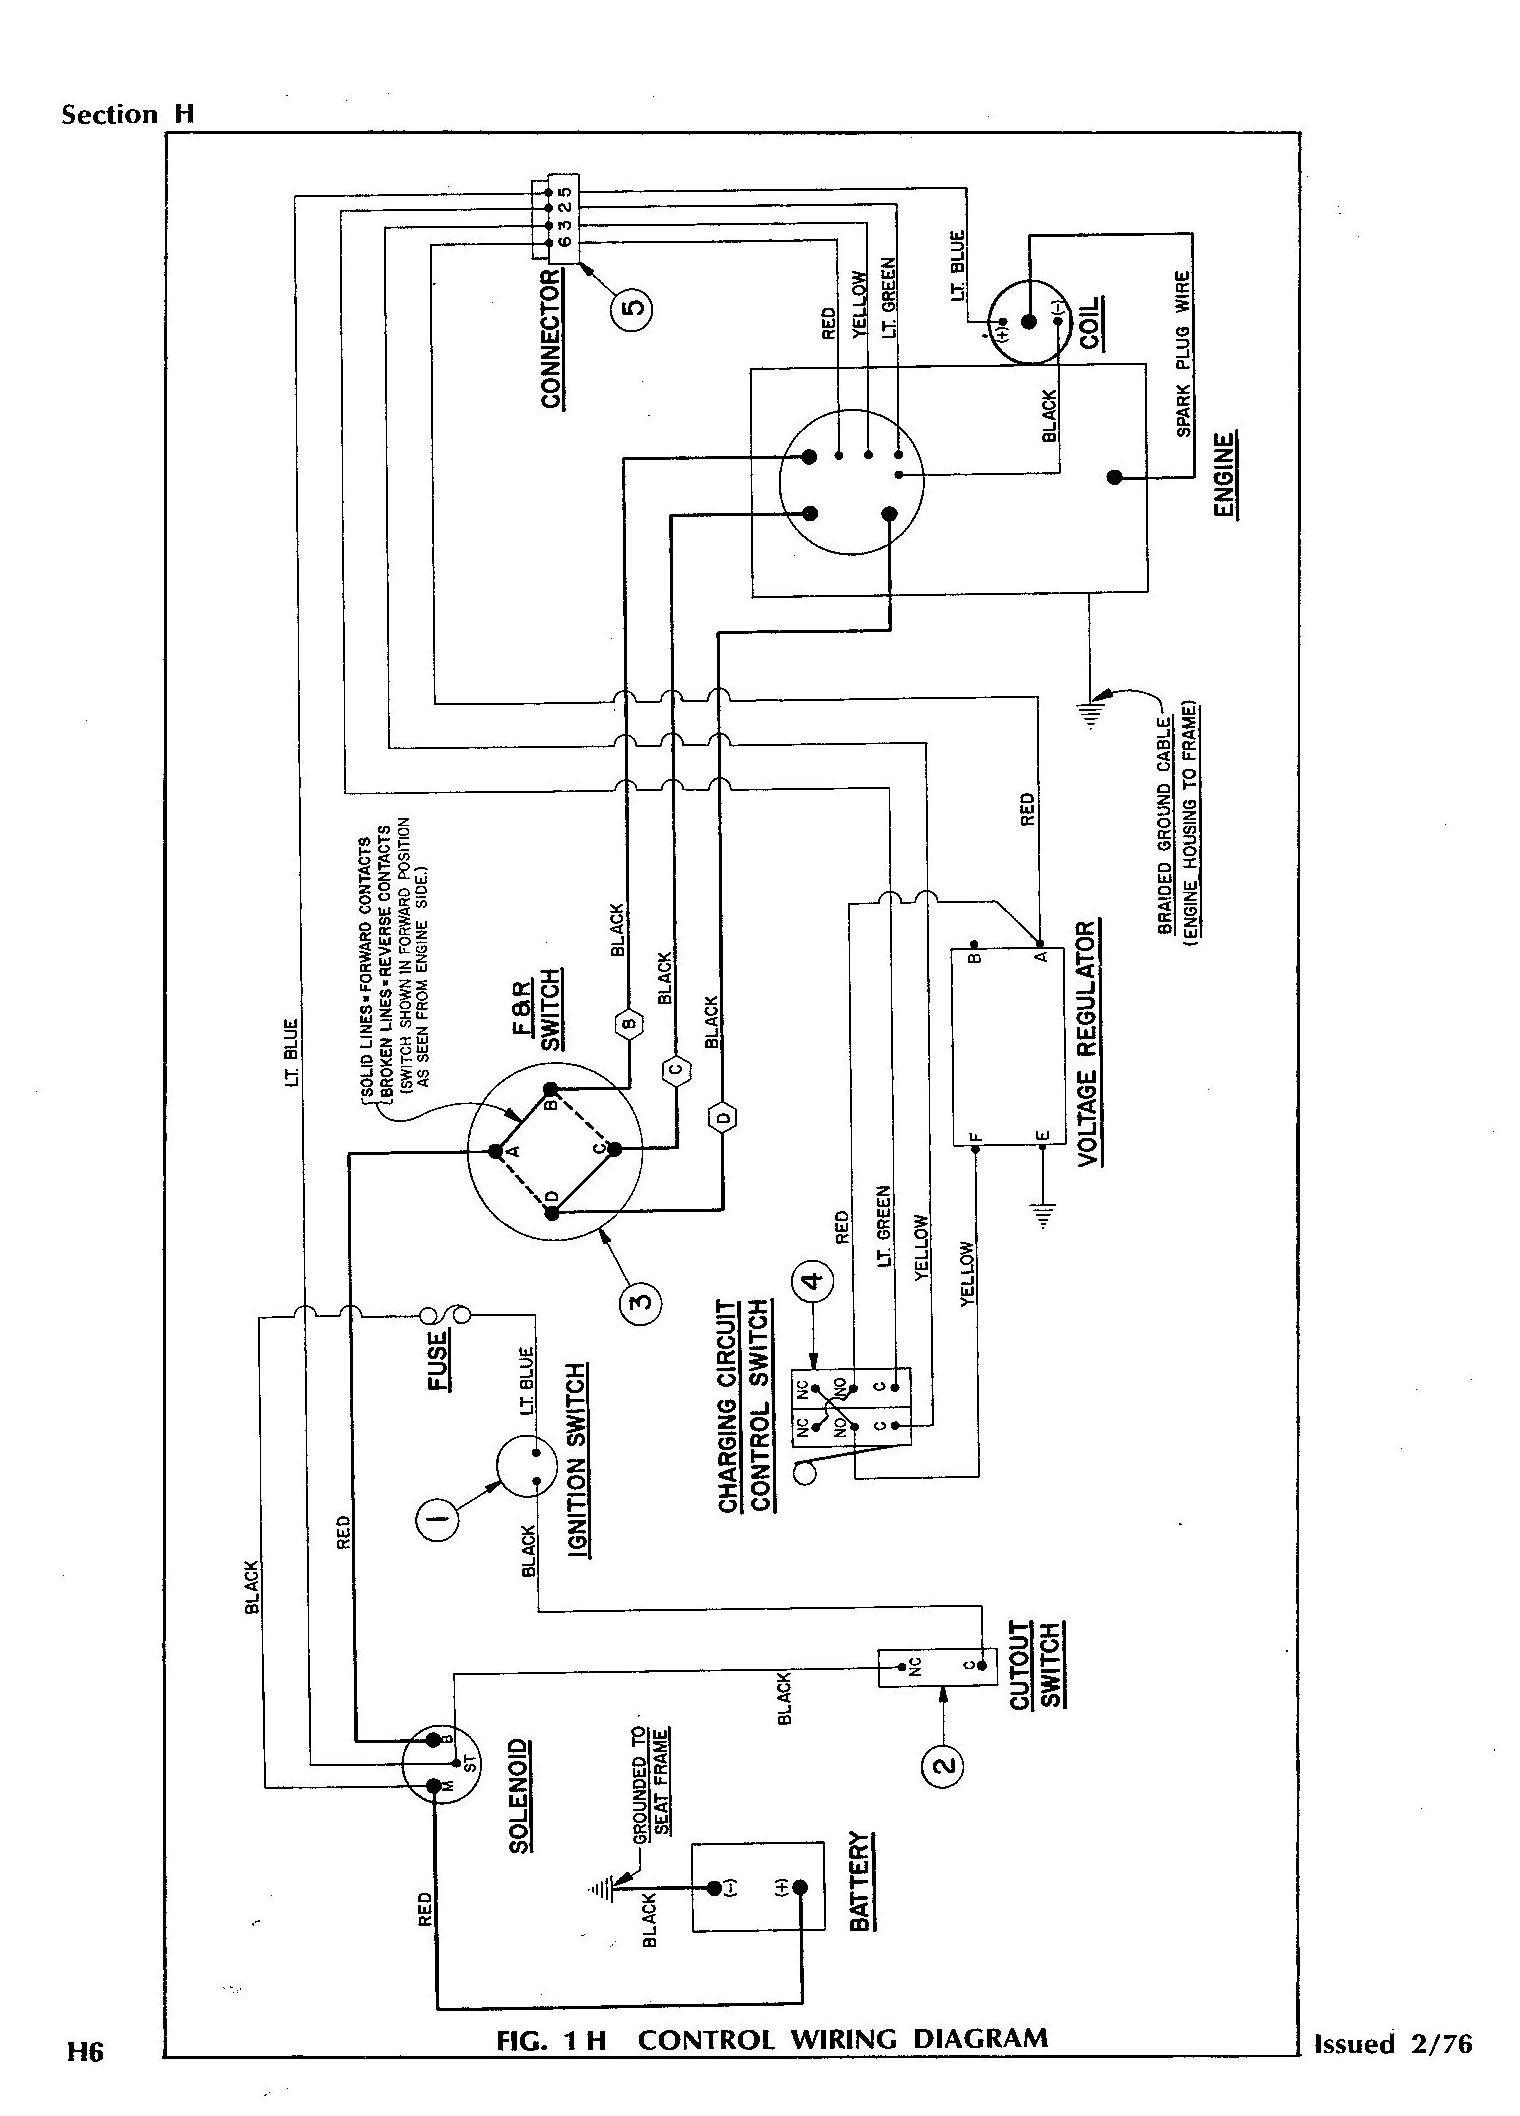 ez go golf cart wiring diagram gas engine ezgo gas golf cart wiring diagram with template diagrams 4a